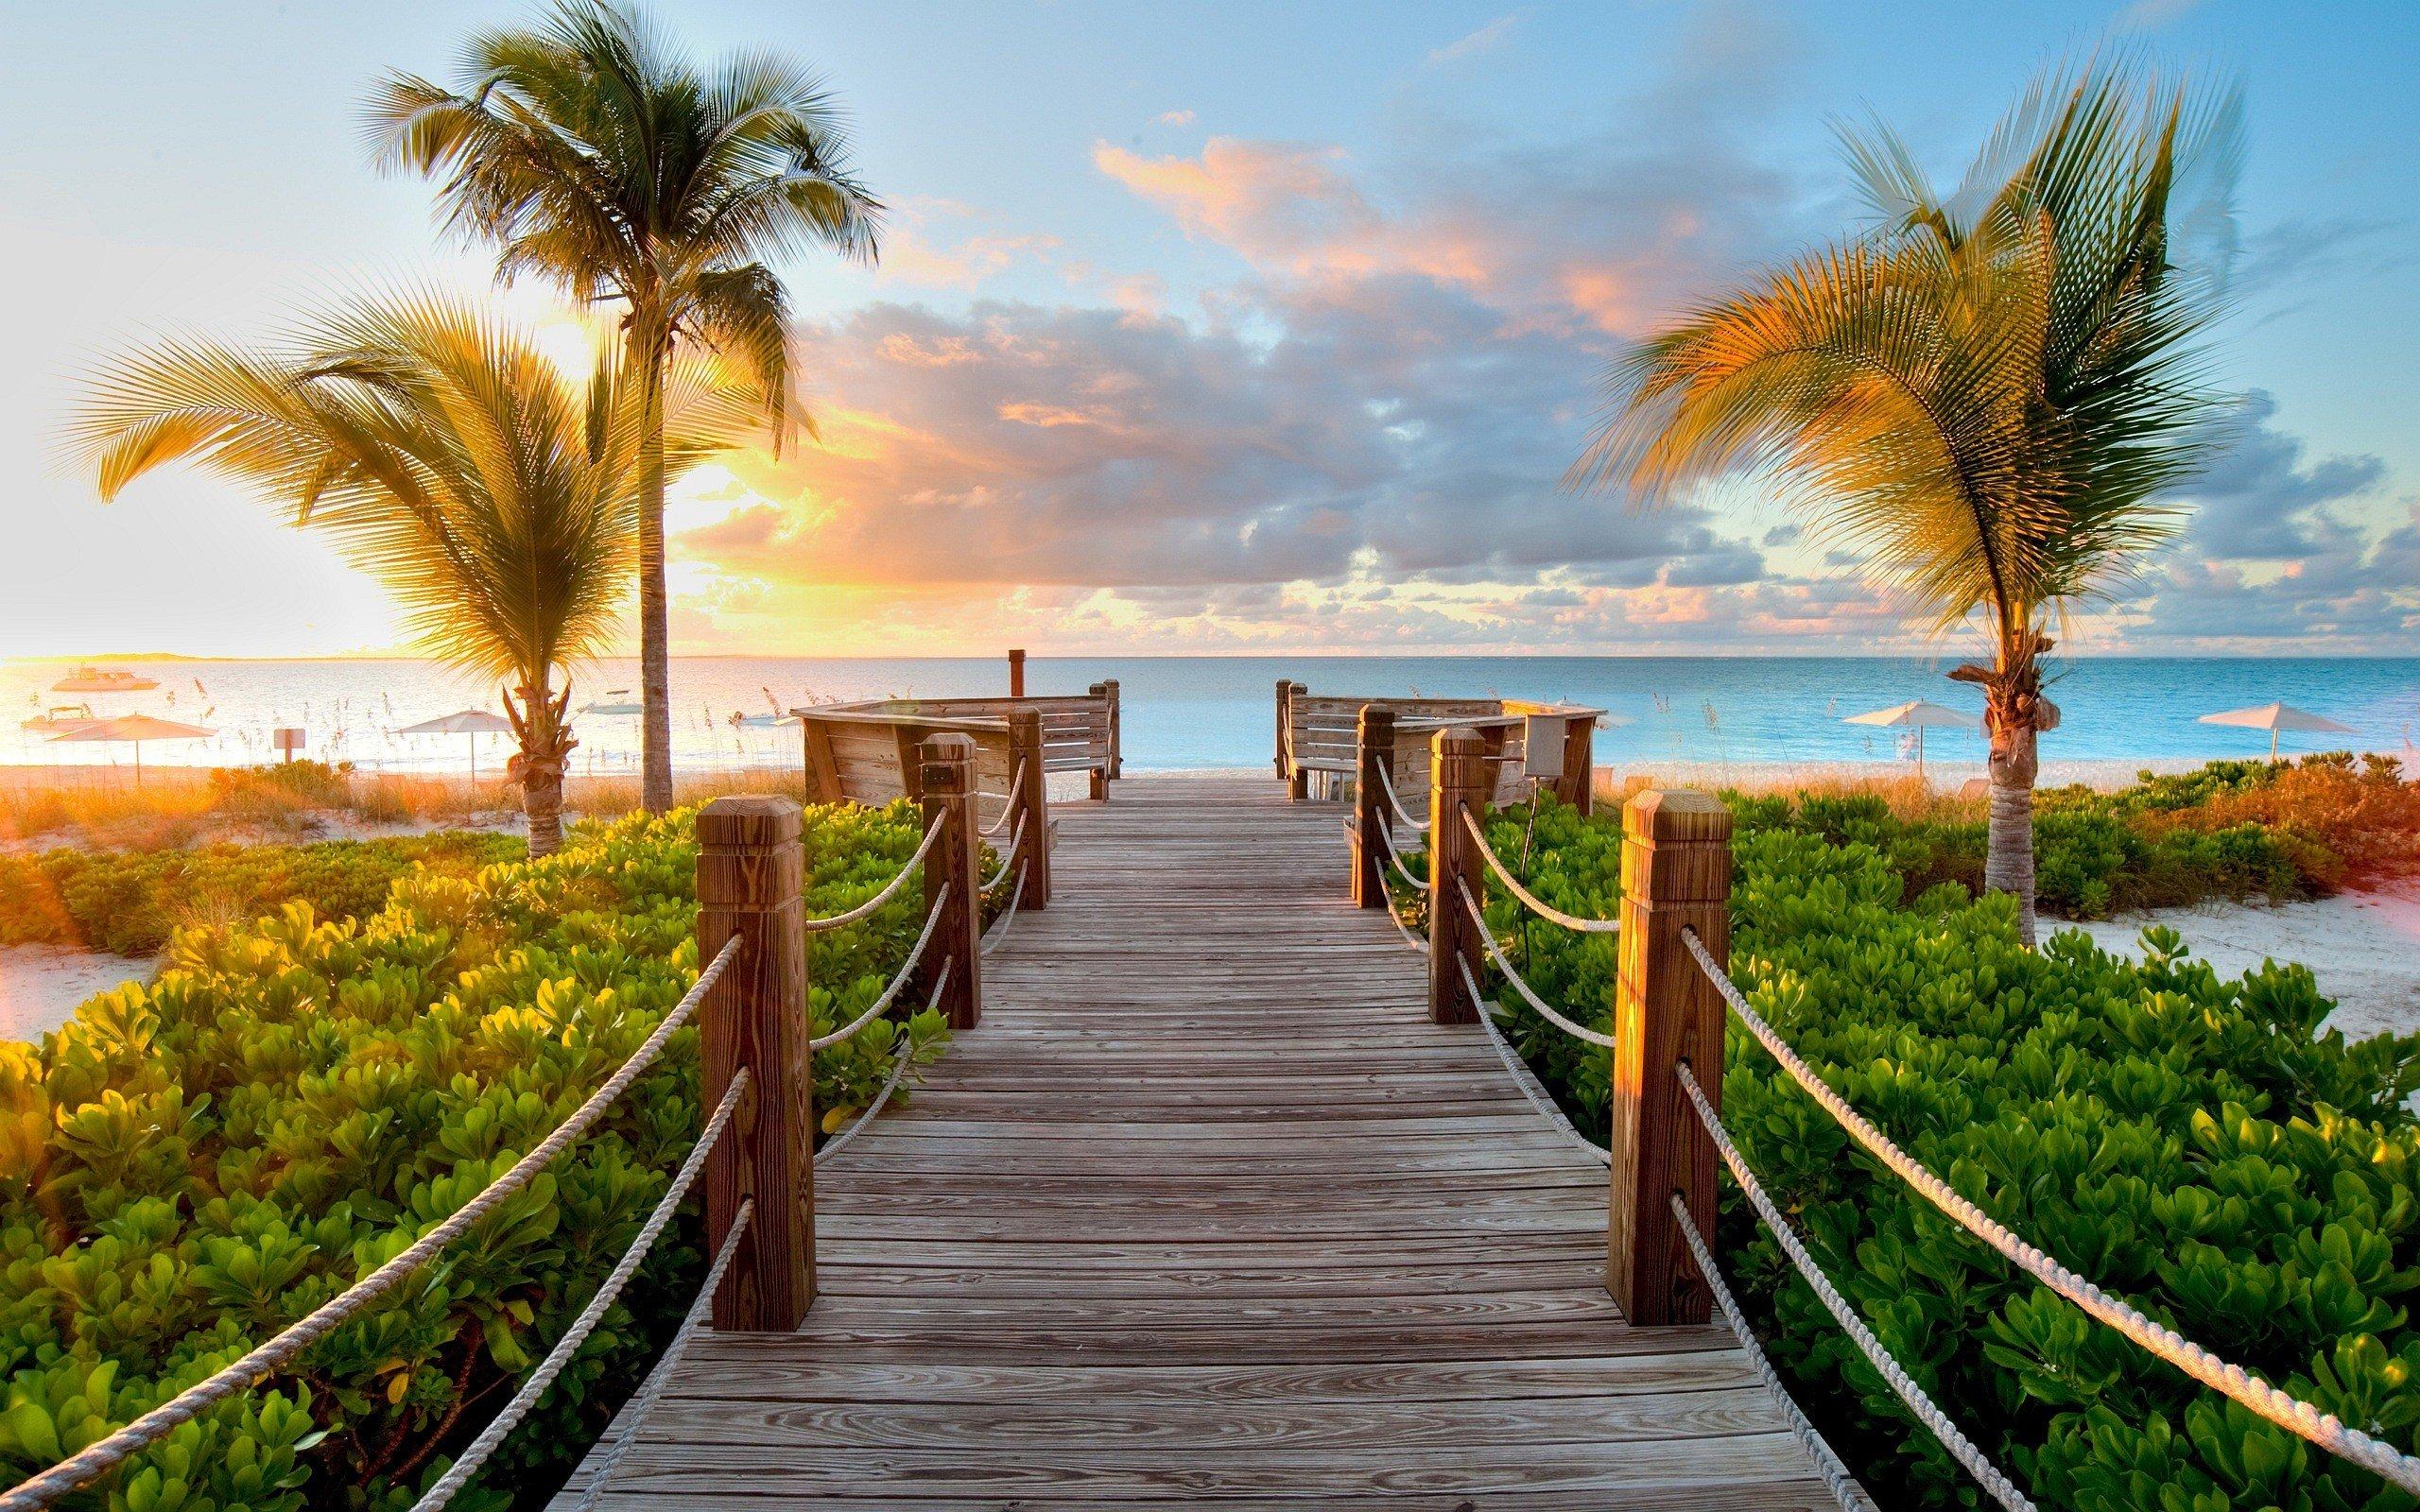 sunset, Path, Island, Beach, Palm trees